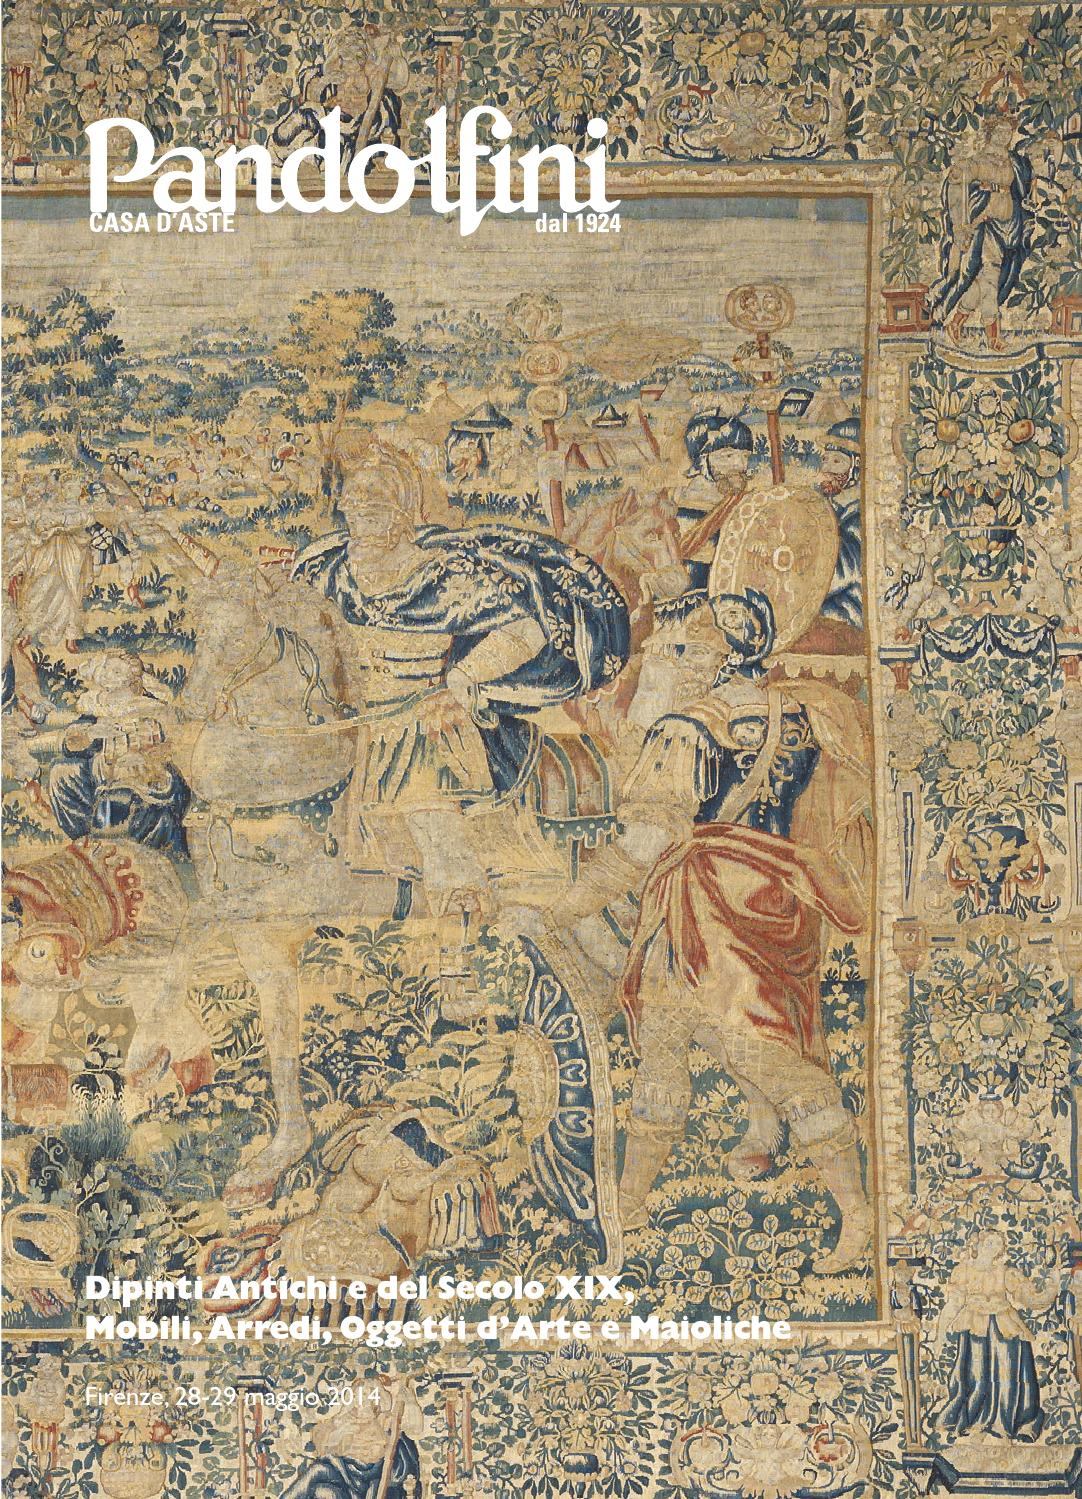 Asta dipinti antichi dipinti del secolo xix mobili for Asta mobili antichi